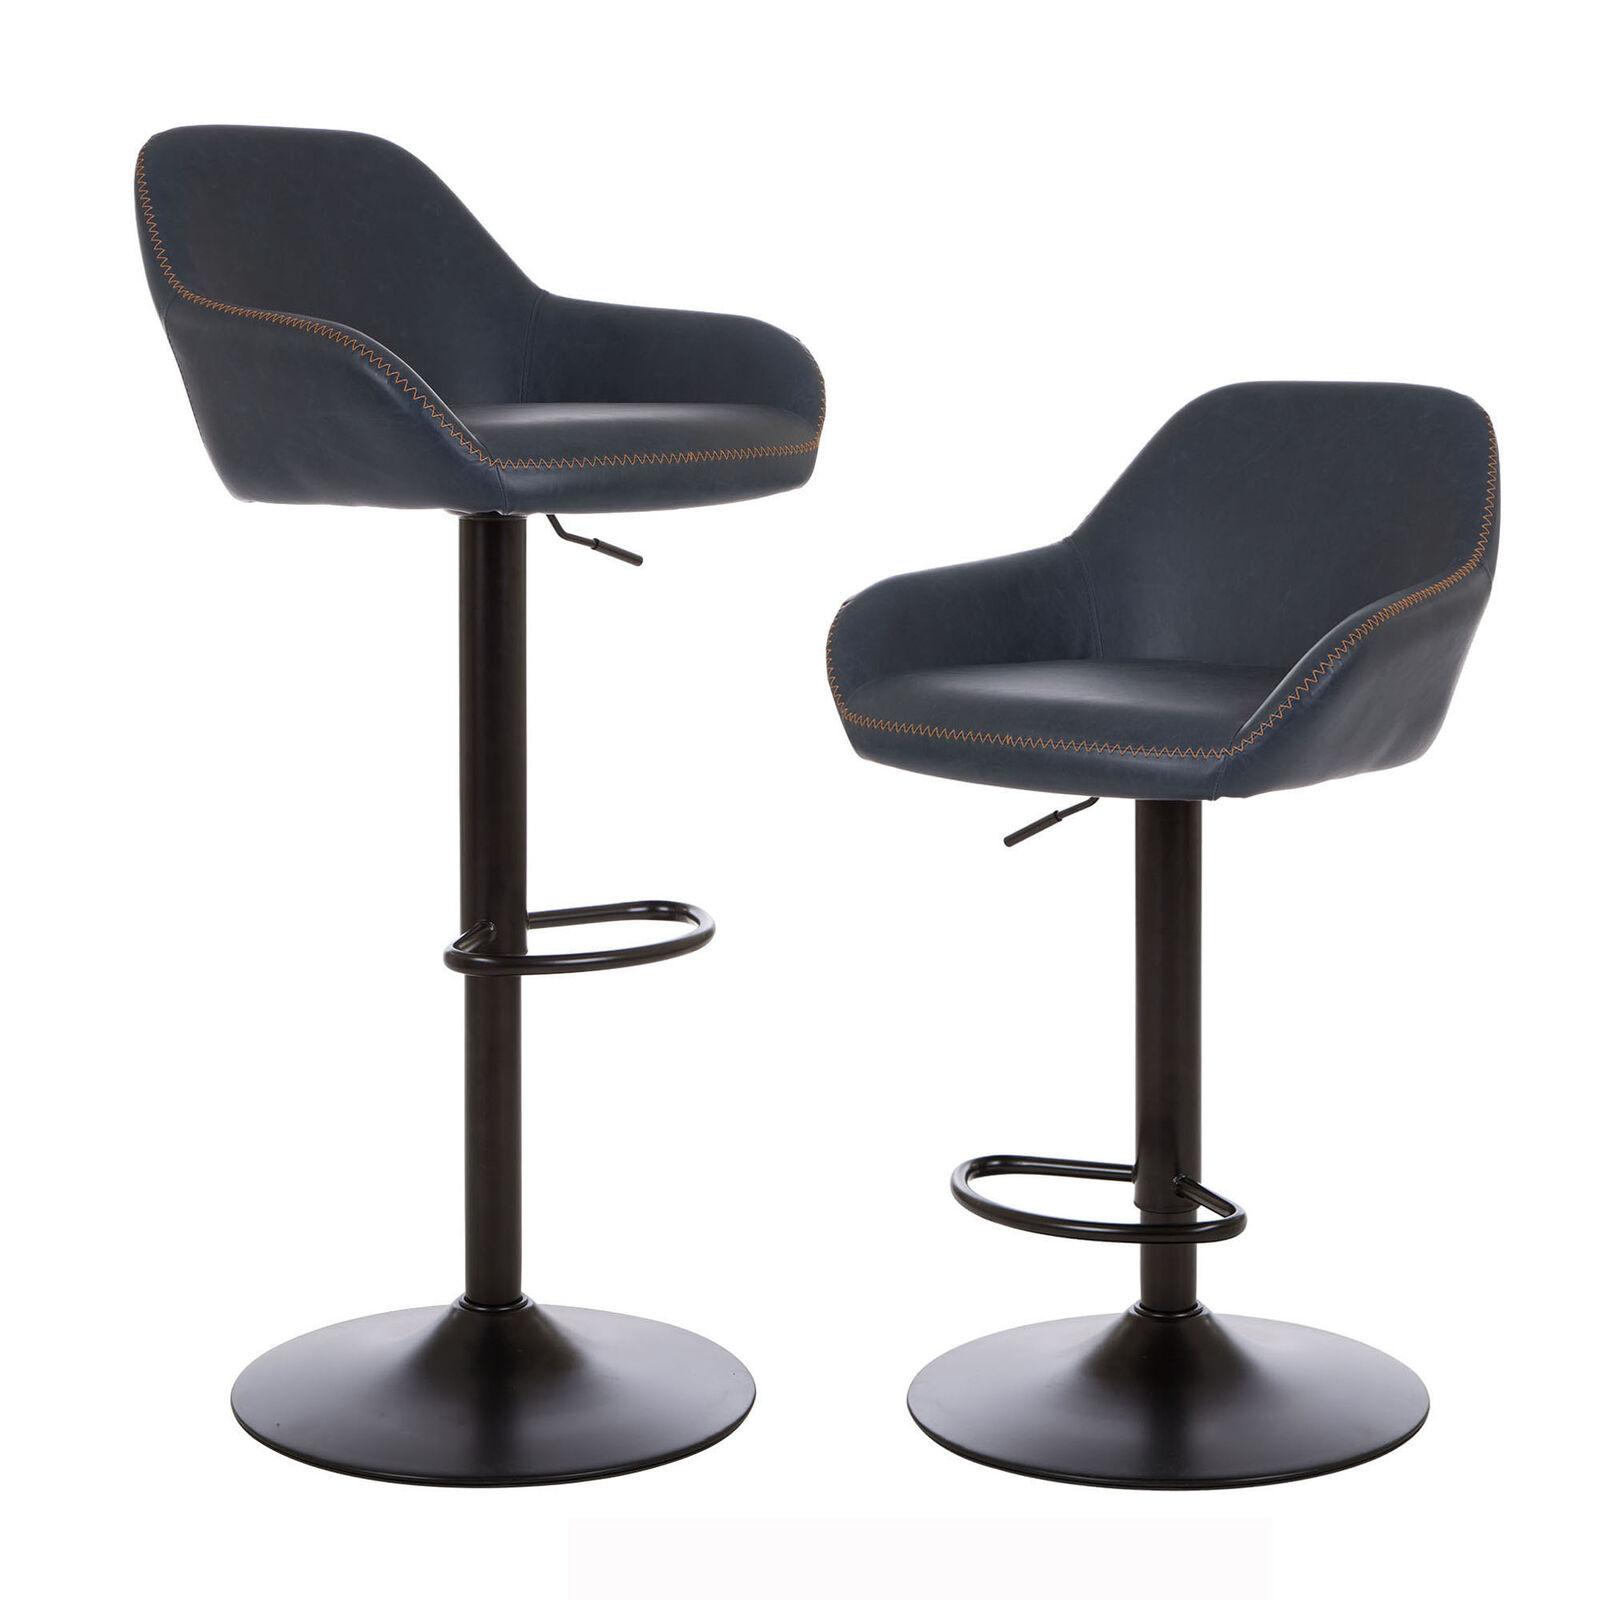 Stupendous Details About Glitzhome Industrial Pu Leather Swivel Bar Stools Navy Blue Metal Chair Set Of 2 Inzonedesignstudio Interior Chair Design Inzonedesignstudiocom